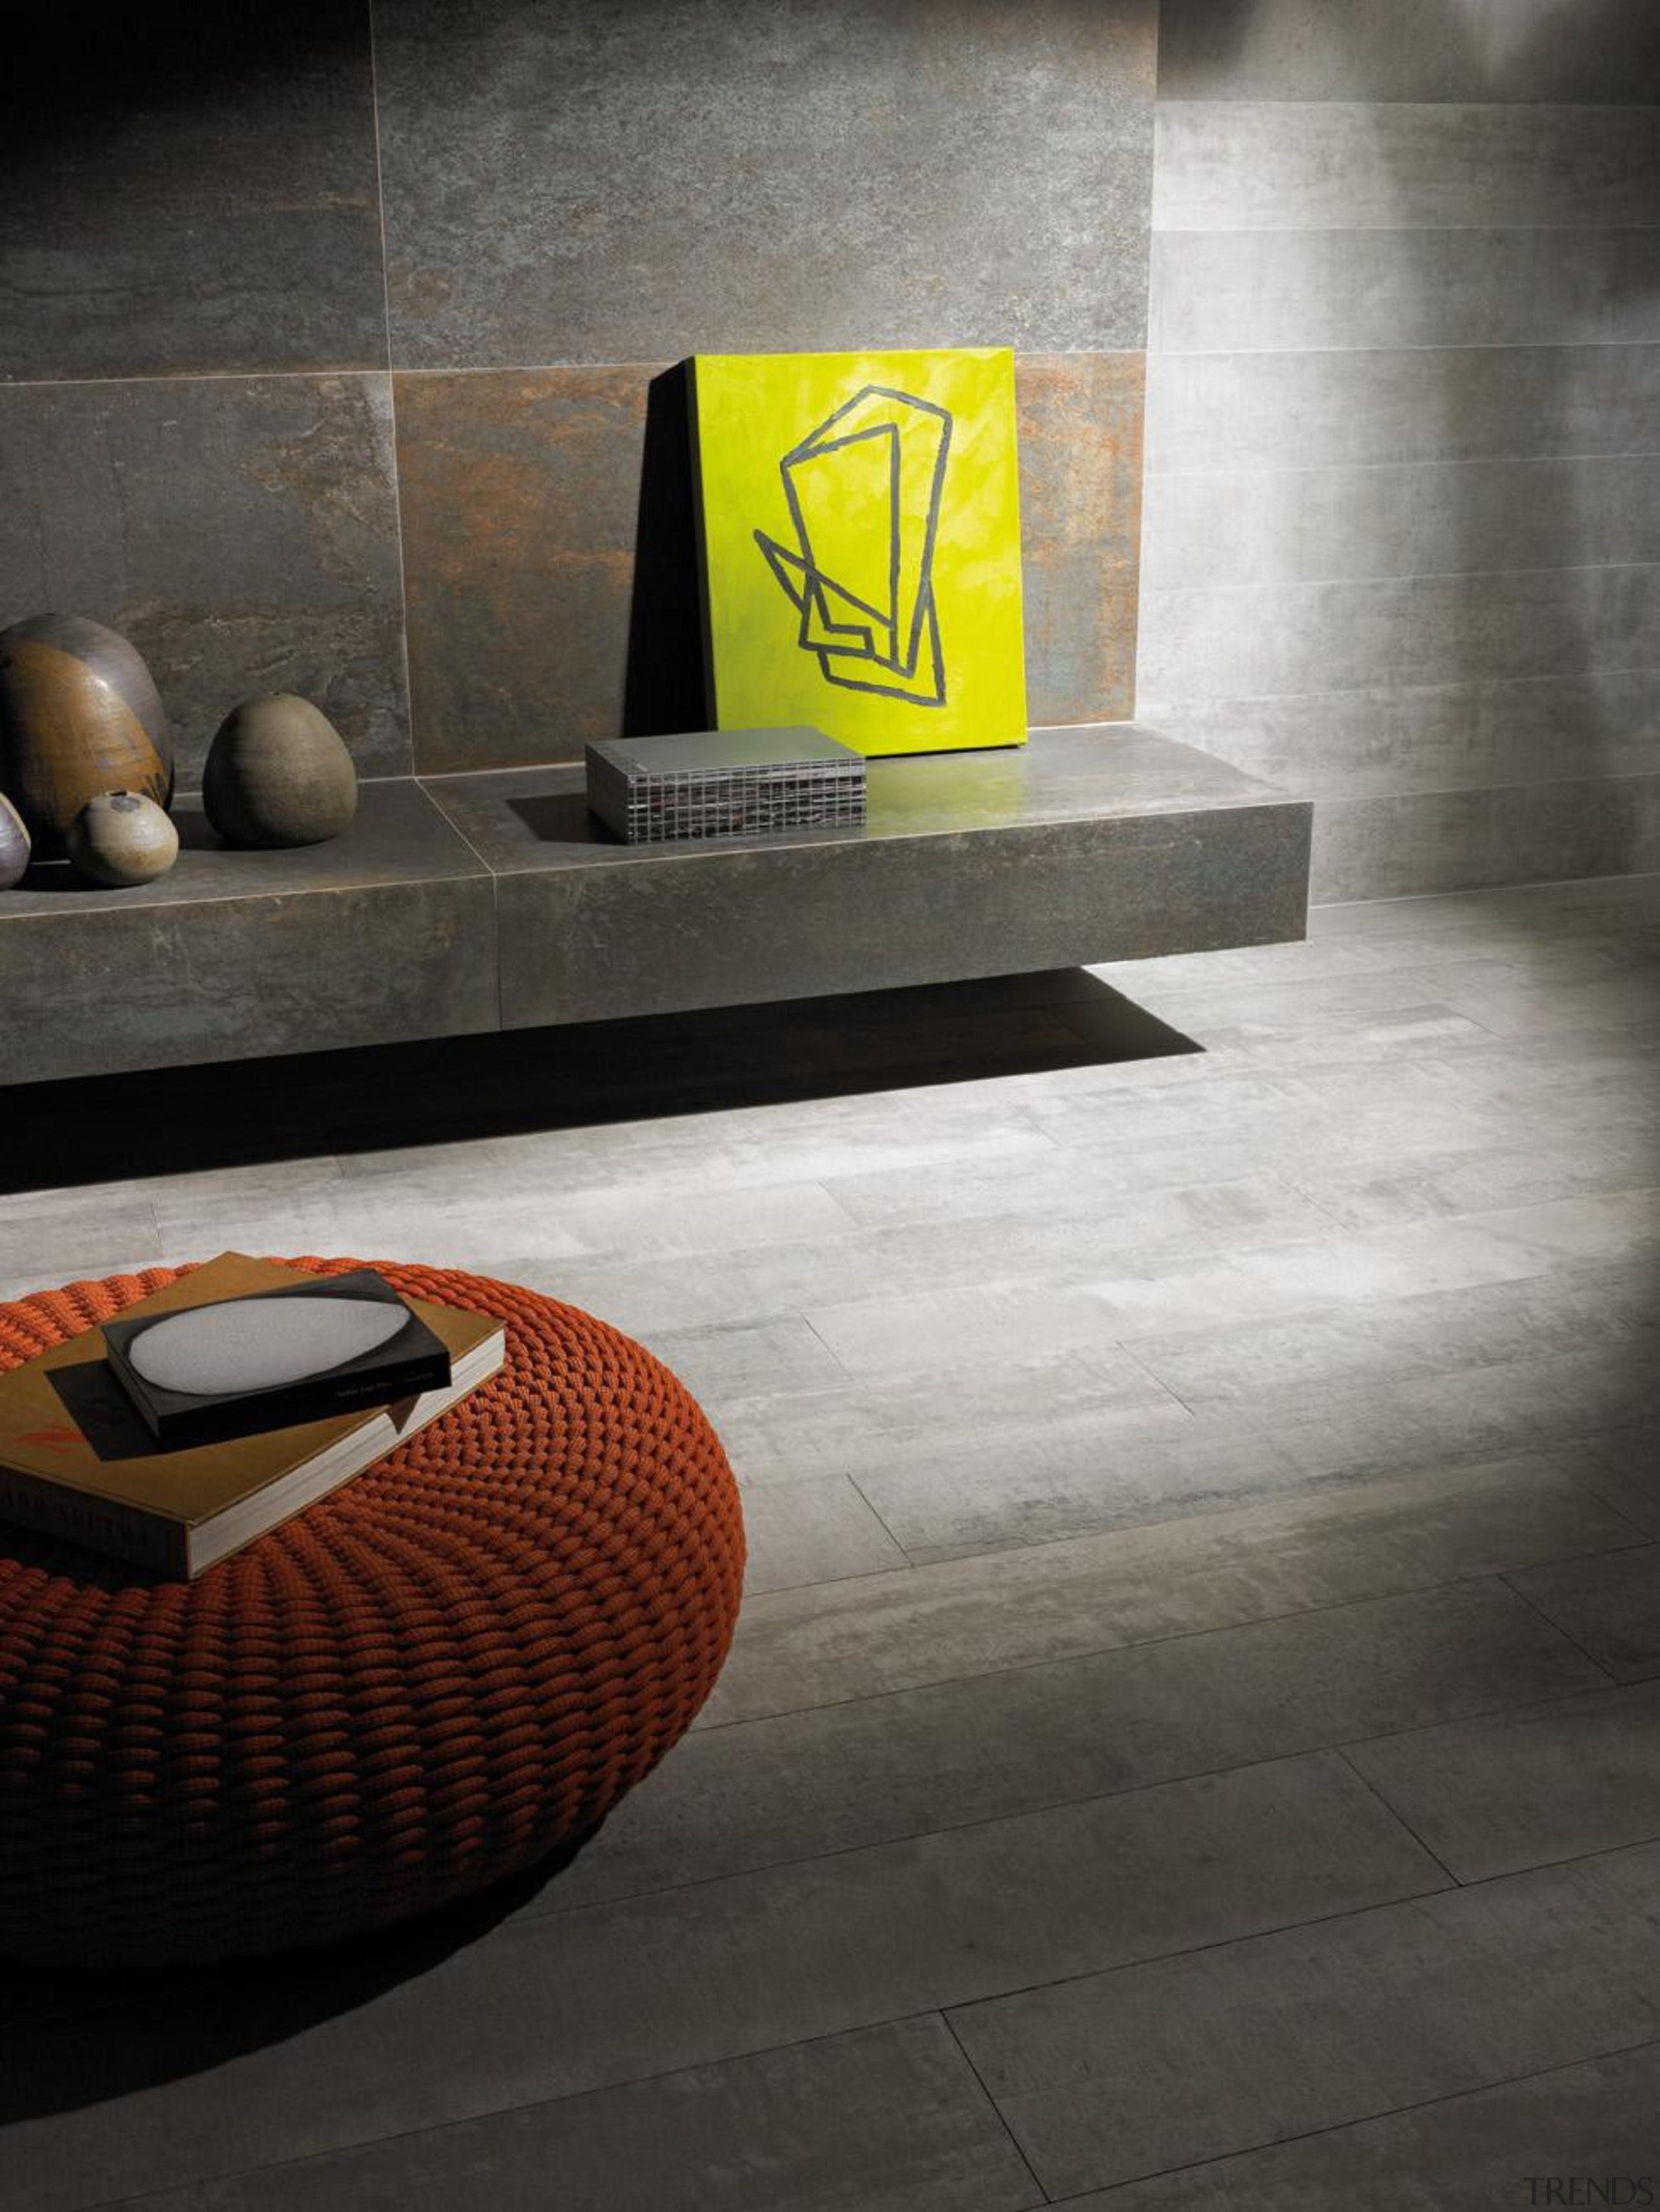 Steel Corten Matt 600x1200mm porcelain tiles. - Steel architecture, chair, floor, flooring, furniture, hardwood, interior design, product design, table, tile, wall, black, gray